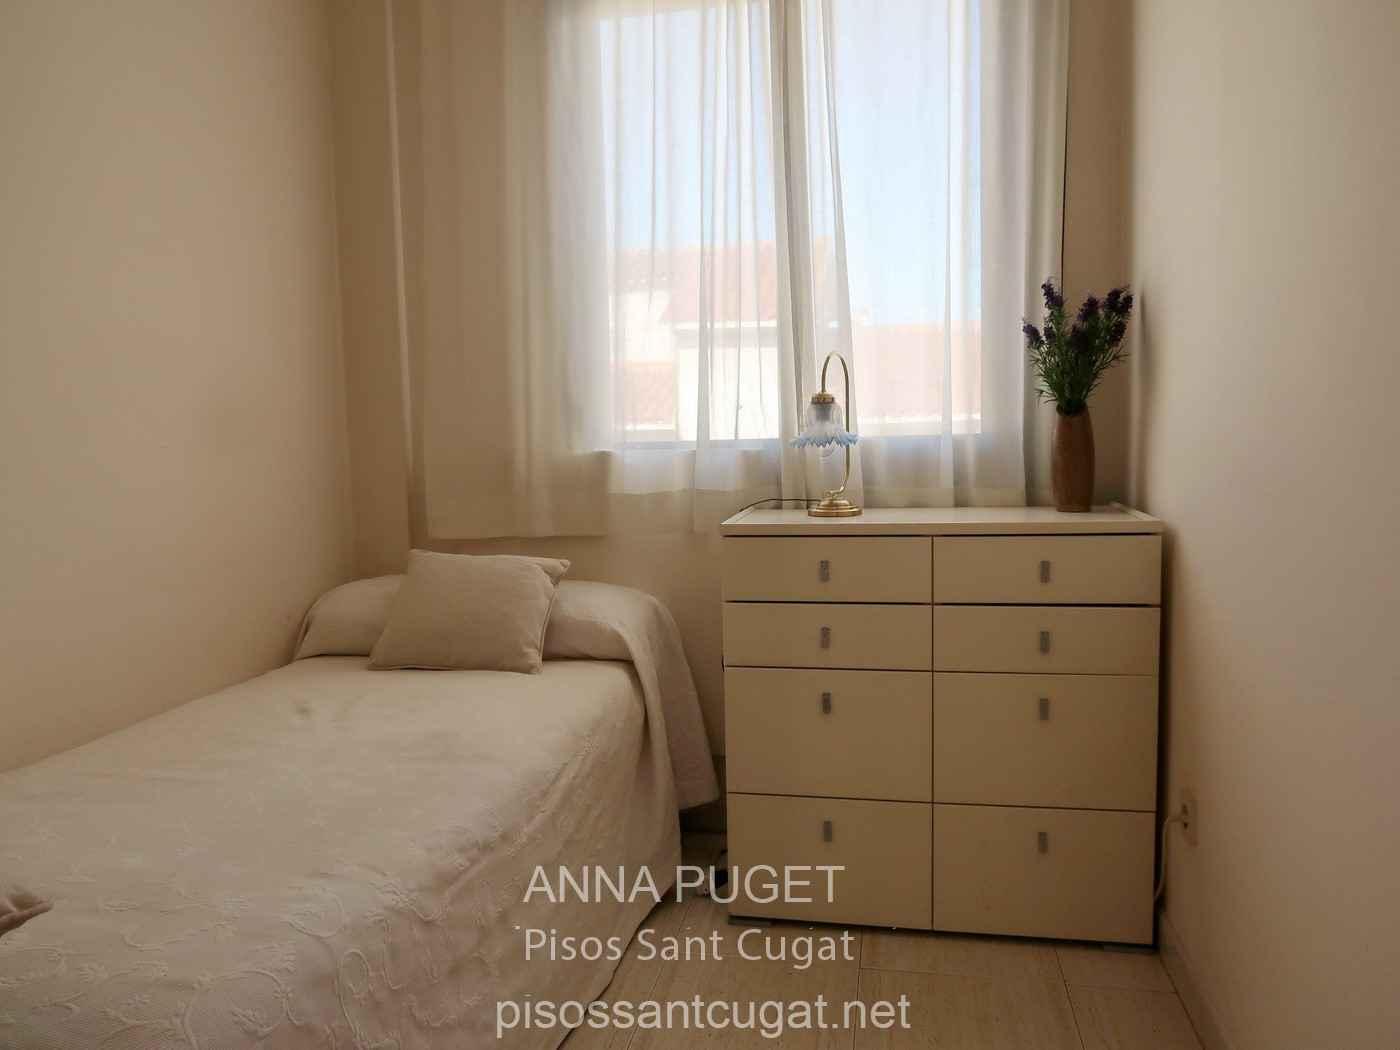 Sant Cugat-Centro Piso